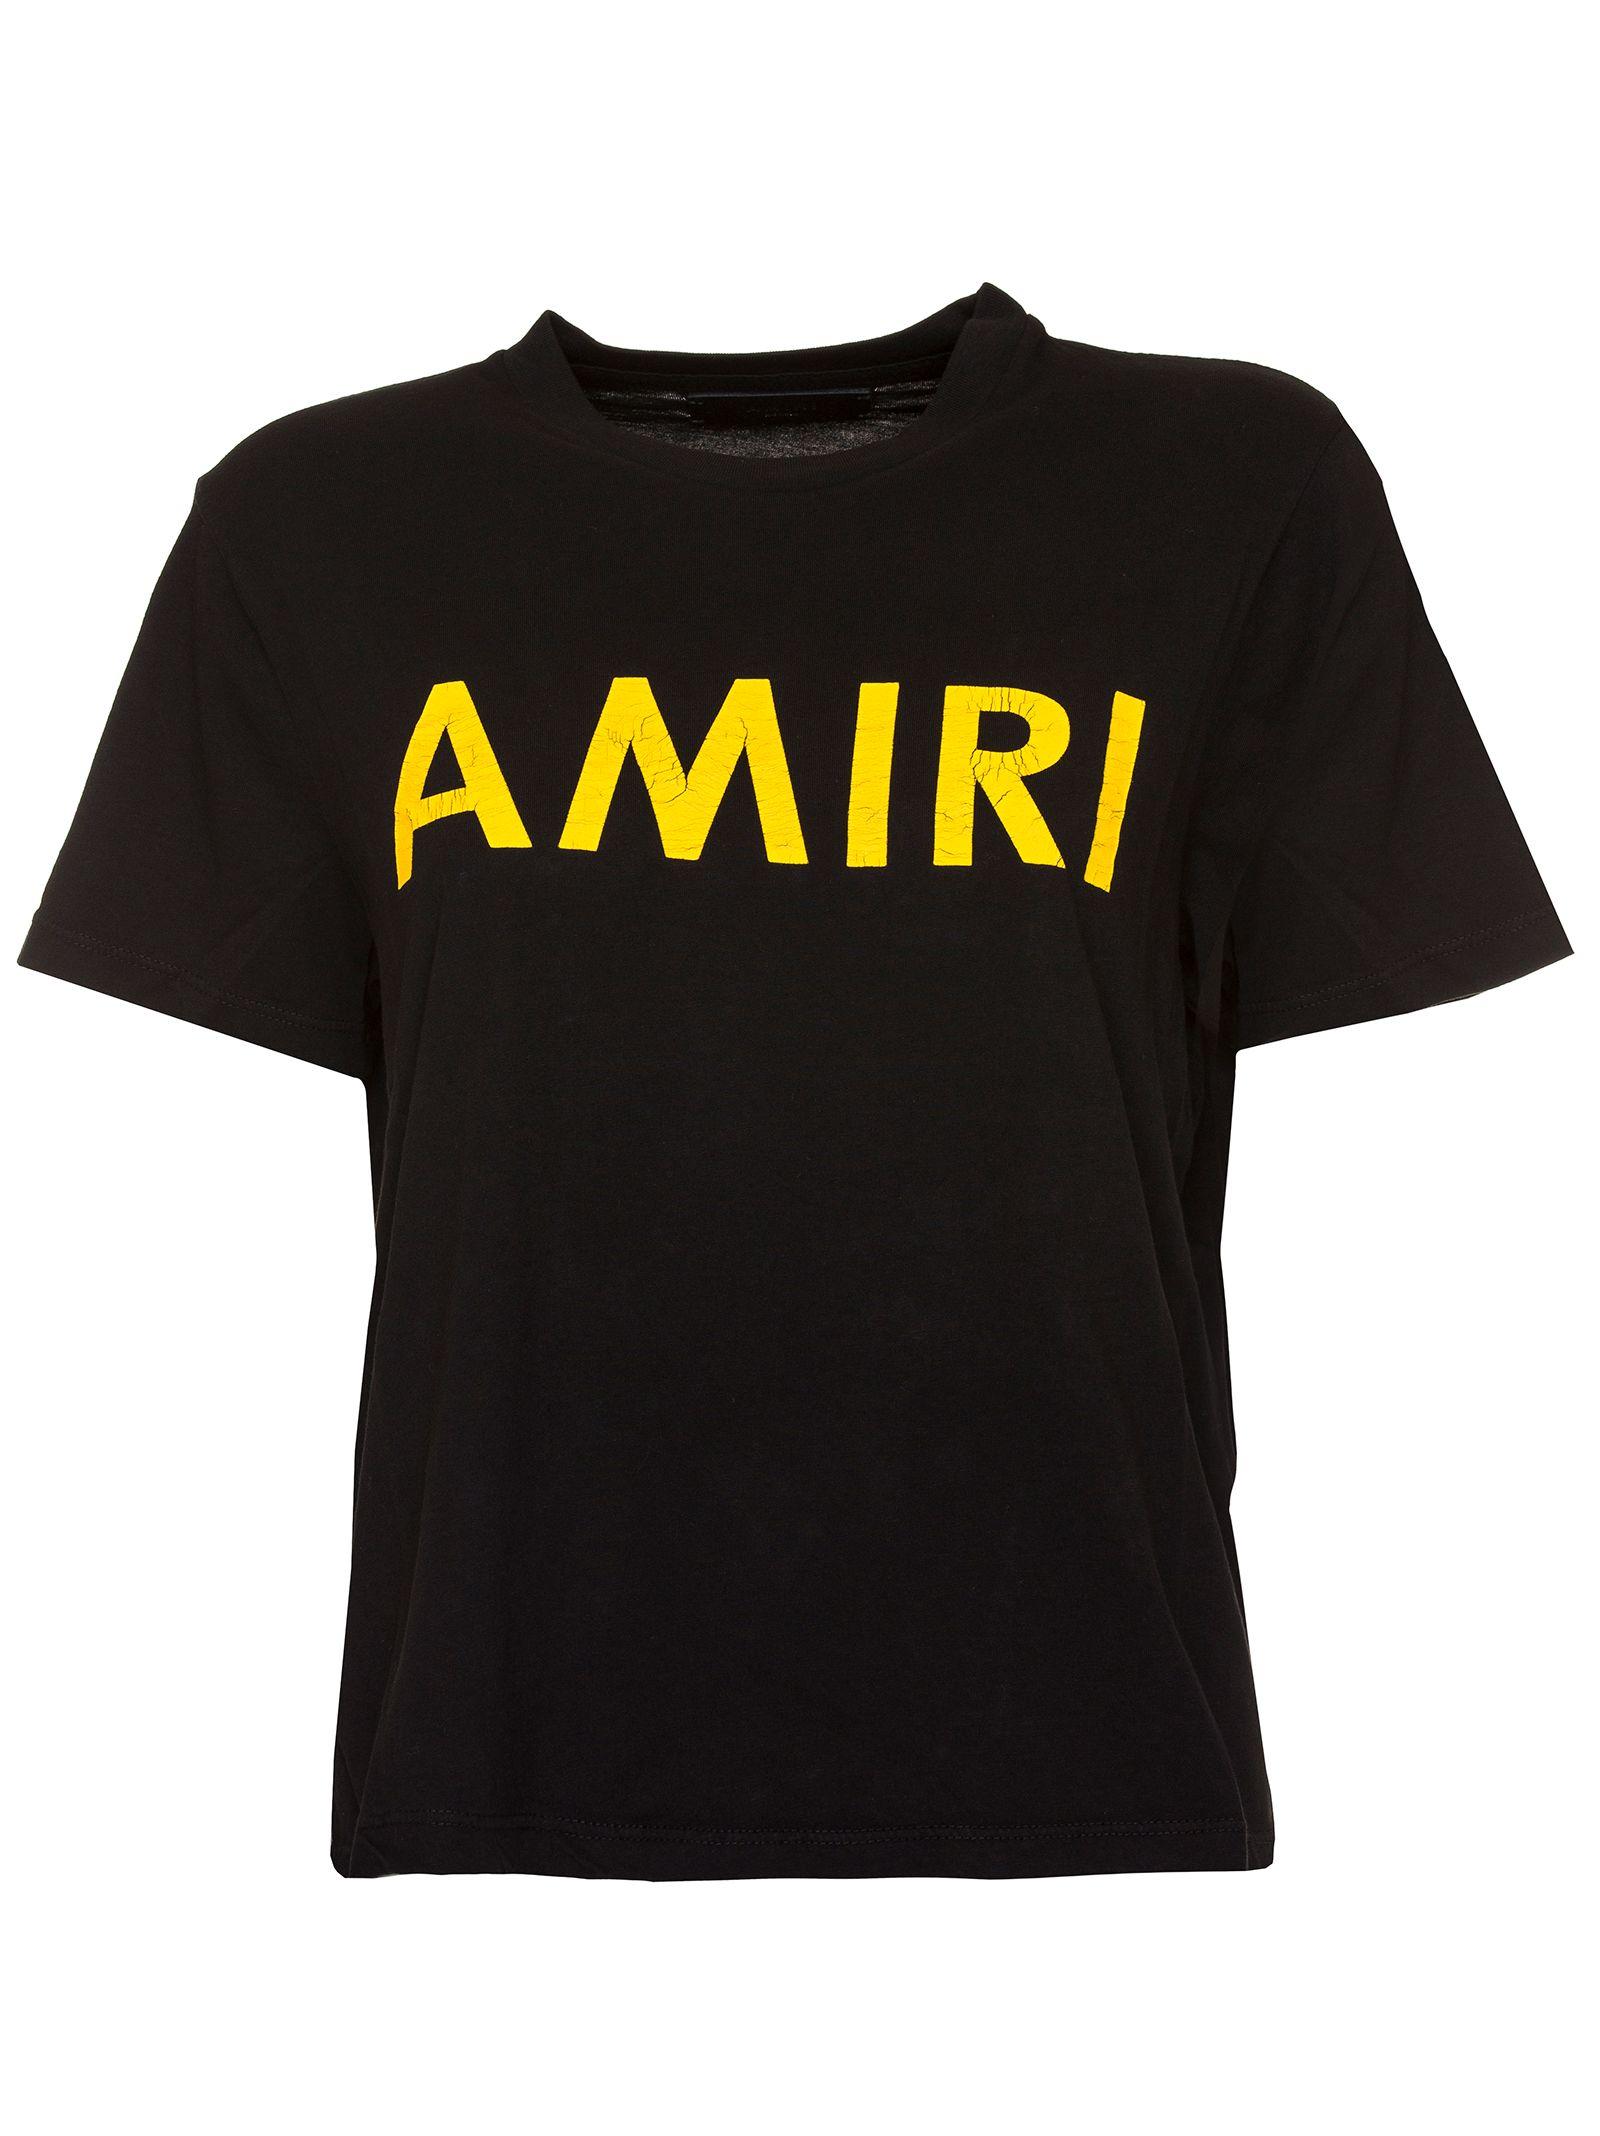 Amiri AMIRI LOGO T-SHIRT